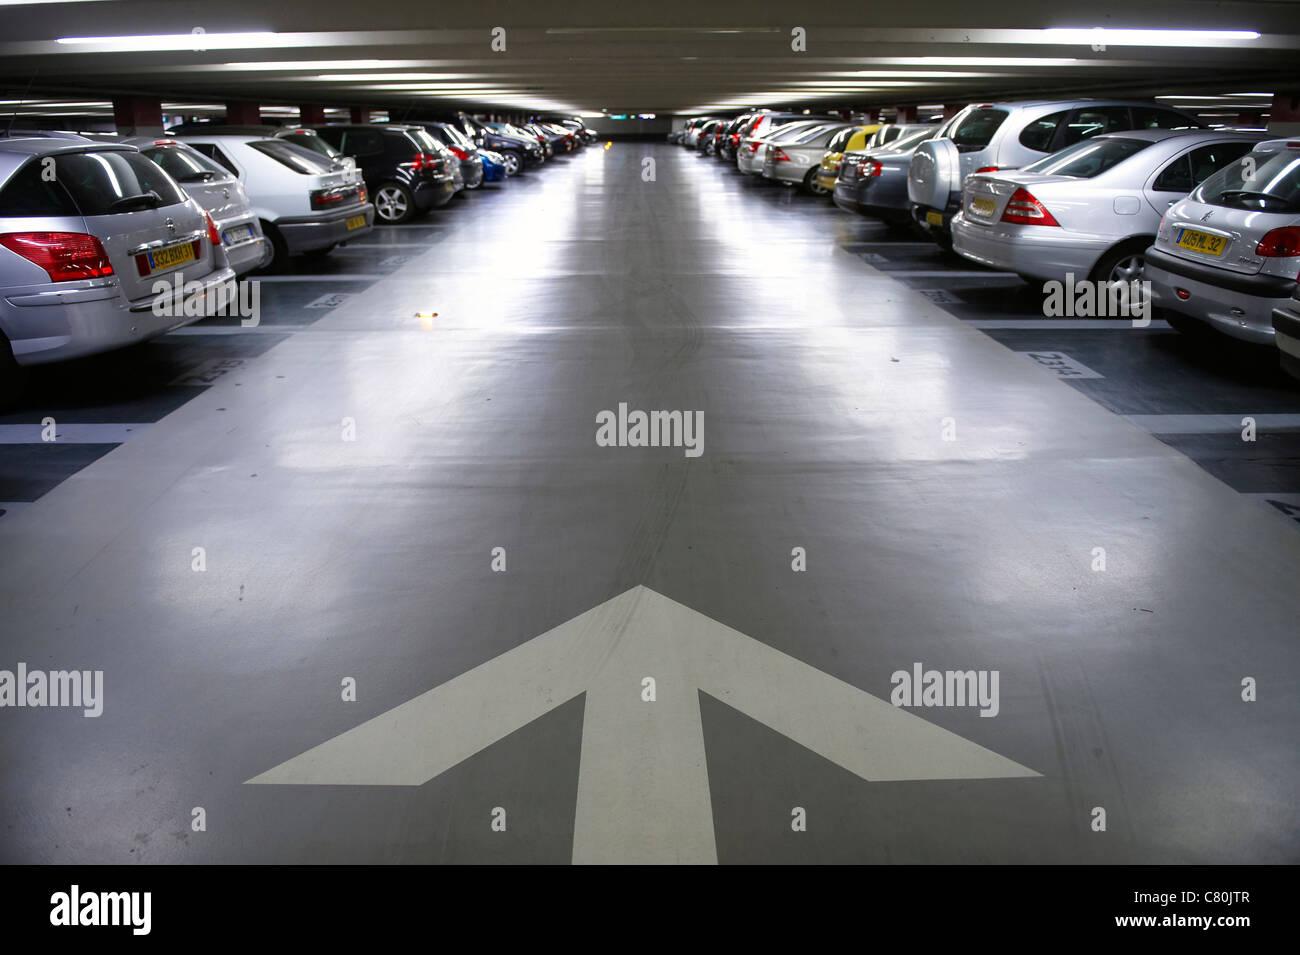 France, Midi Pyrenees, Haute Garonne, Toulouse, Capitole Parking - Stock Image